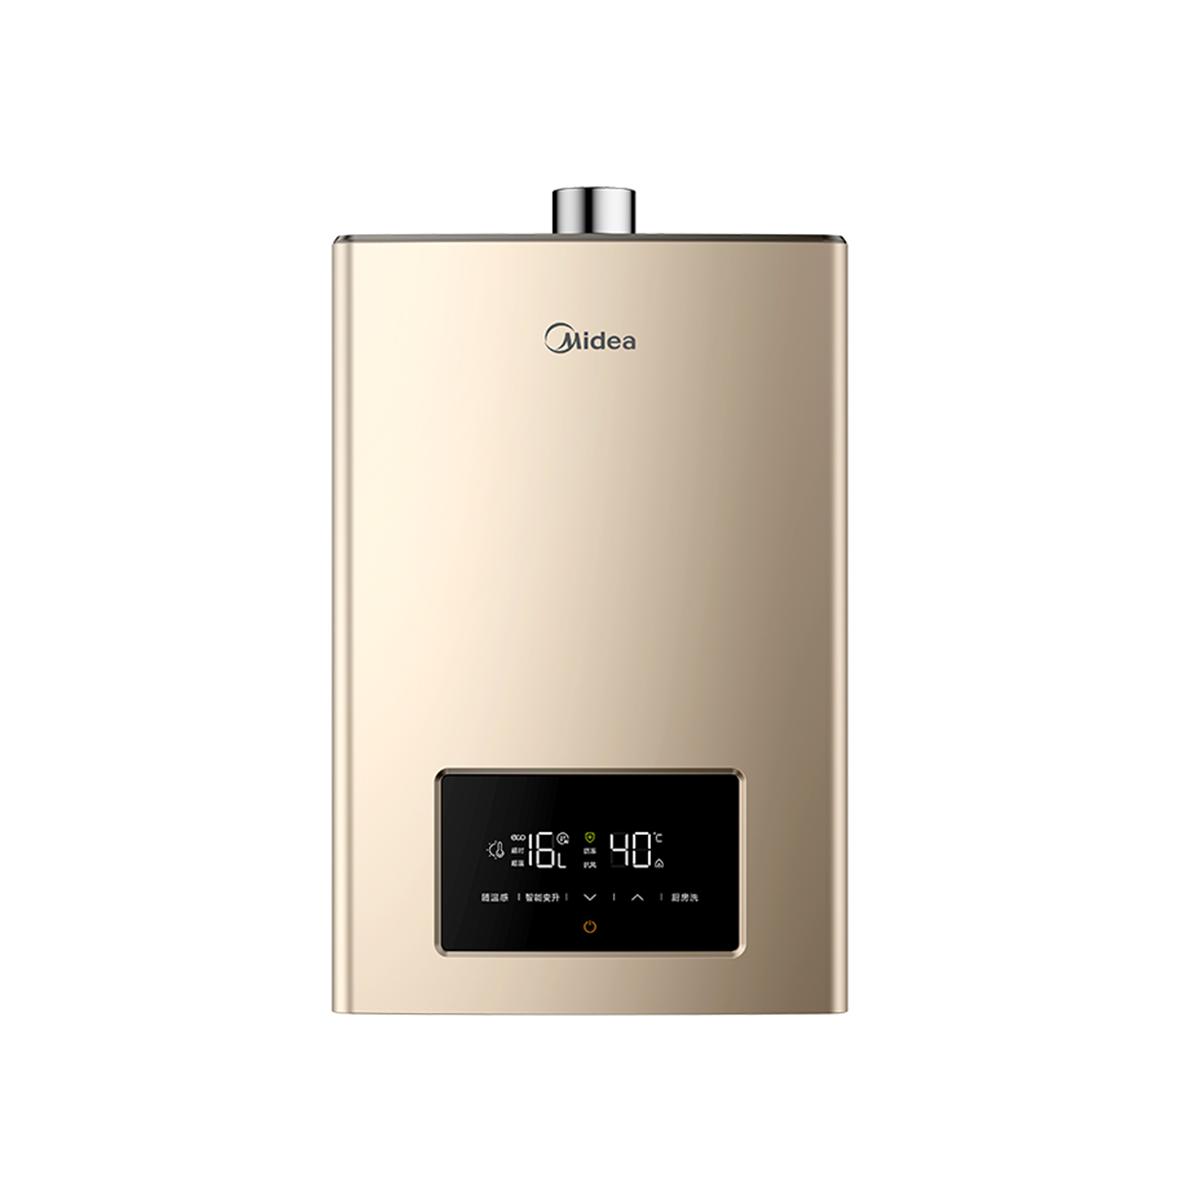 Midea/美的 JSQ34-G6燃气热水器 说明书.pdf